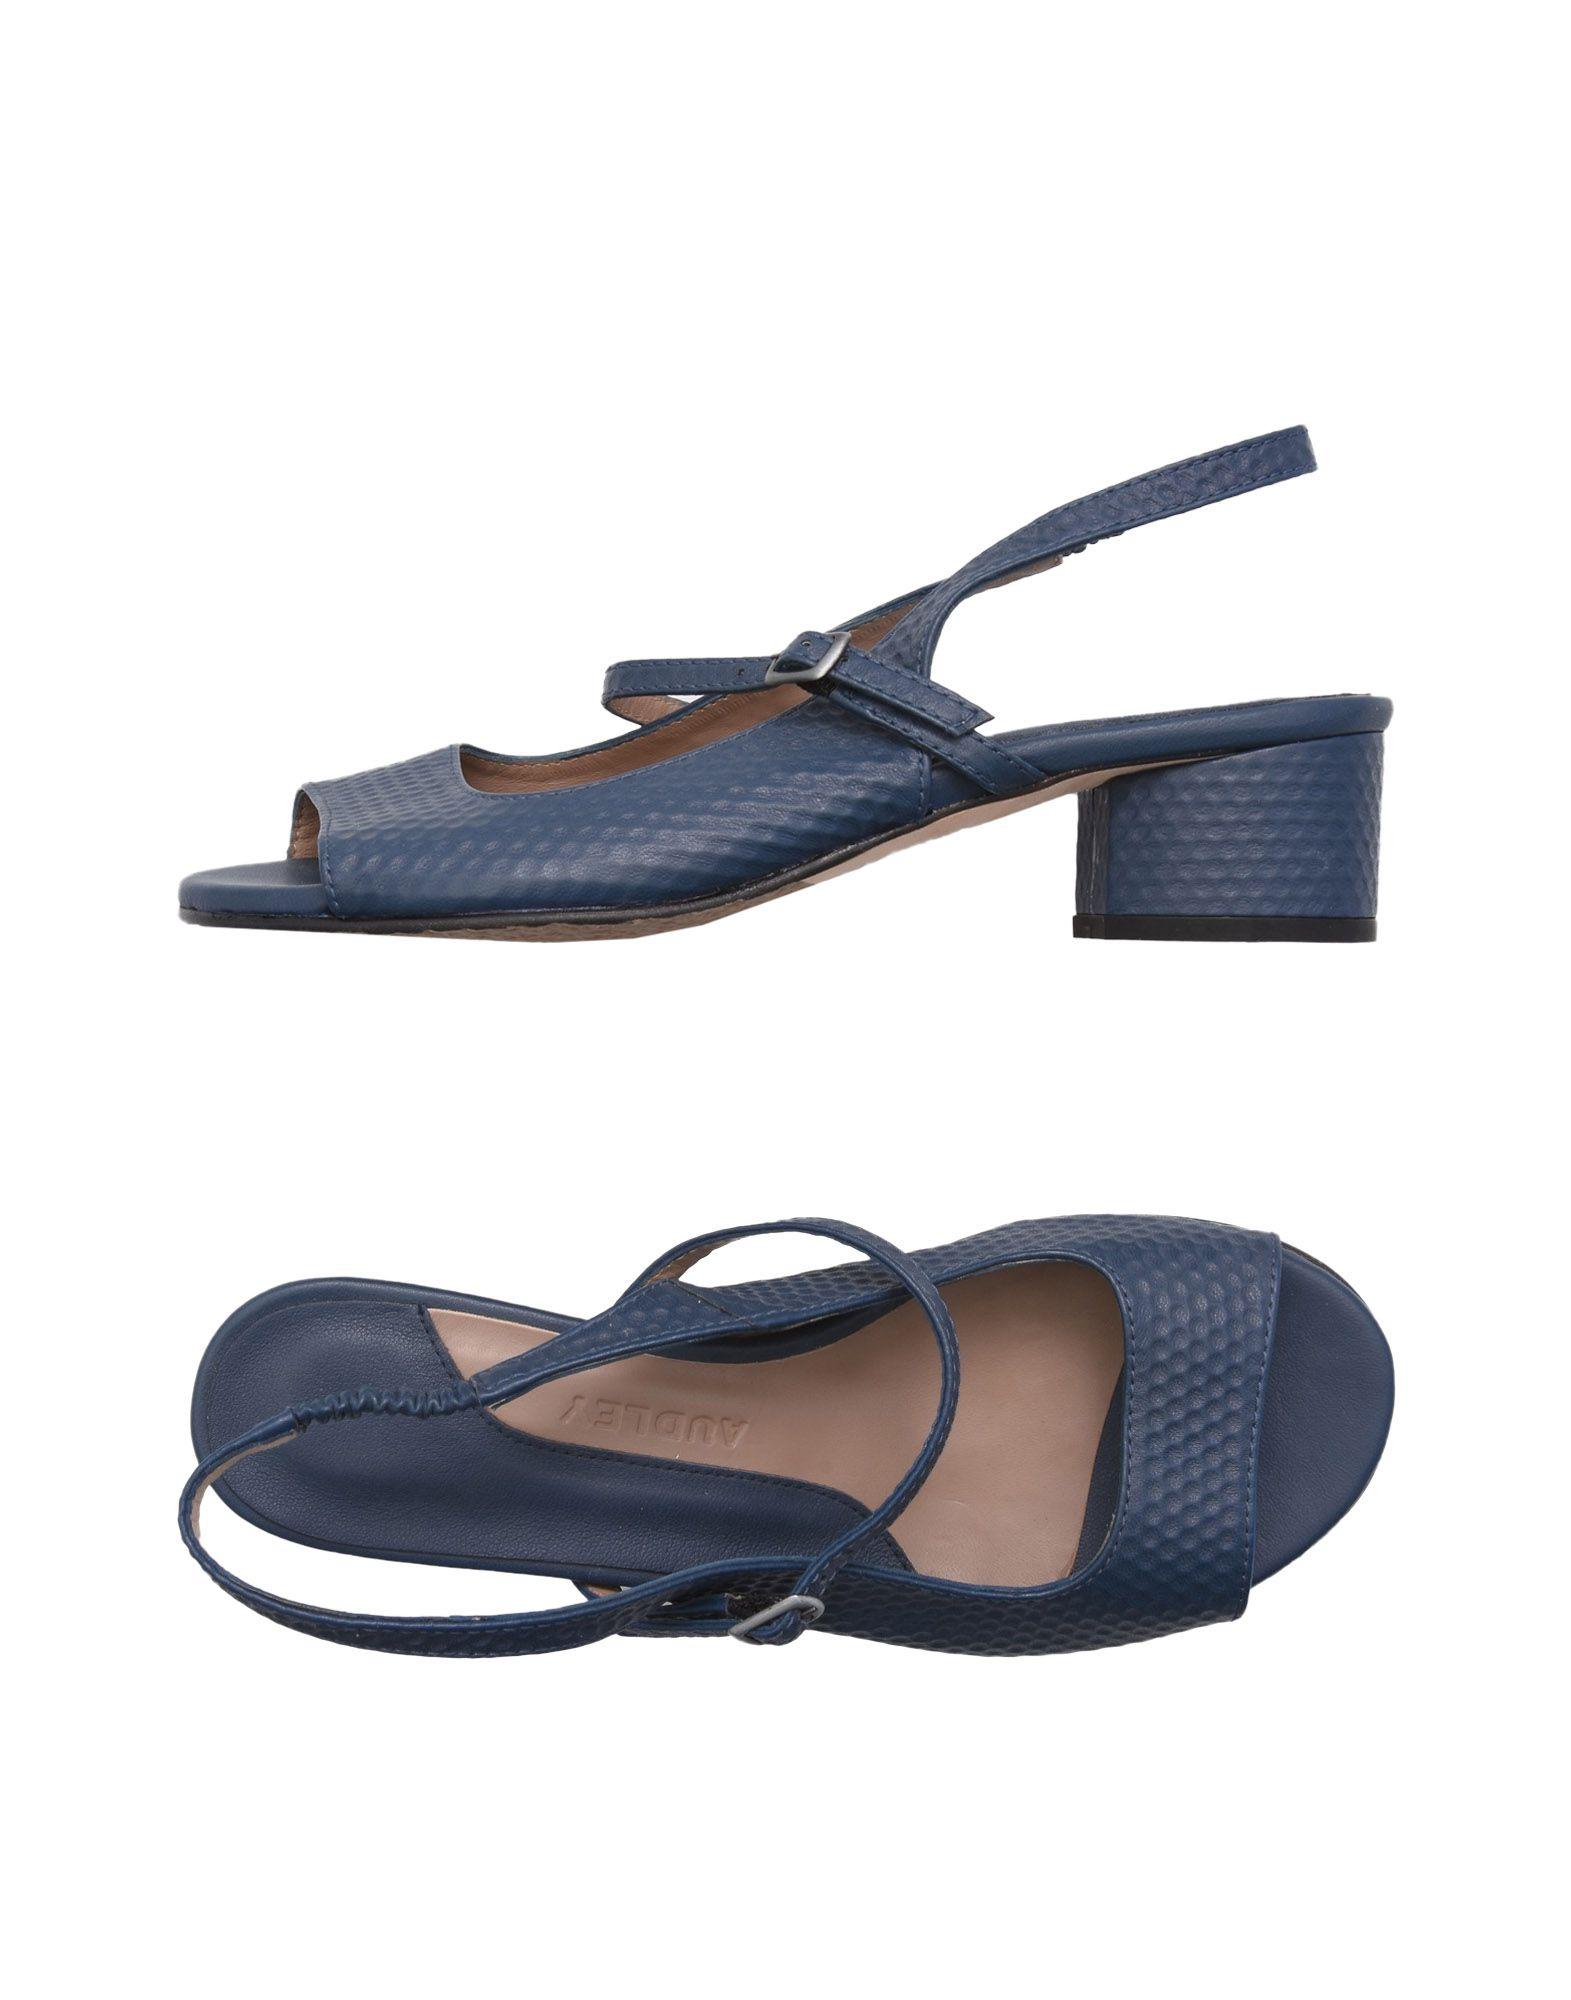 Audley 11492071HB Sandalen Damen  11492071HB Audley Gute Qualität beliebte Schuhe aec861